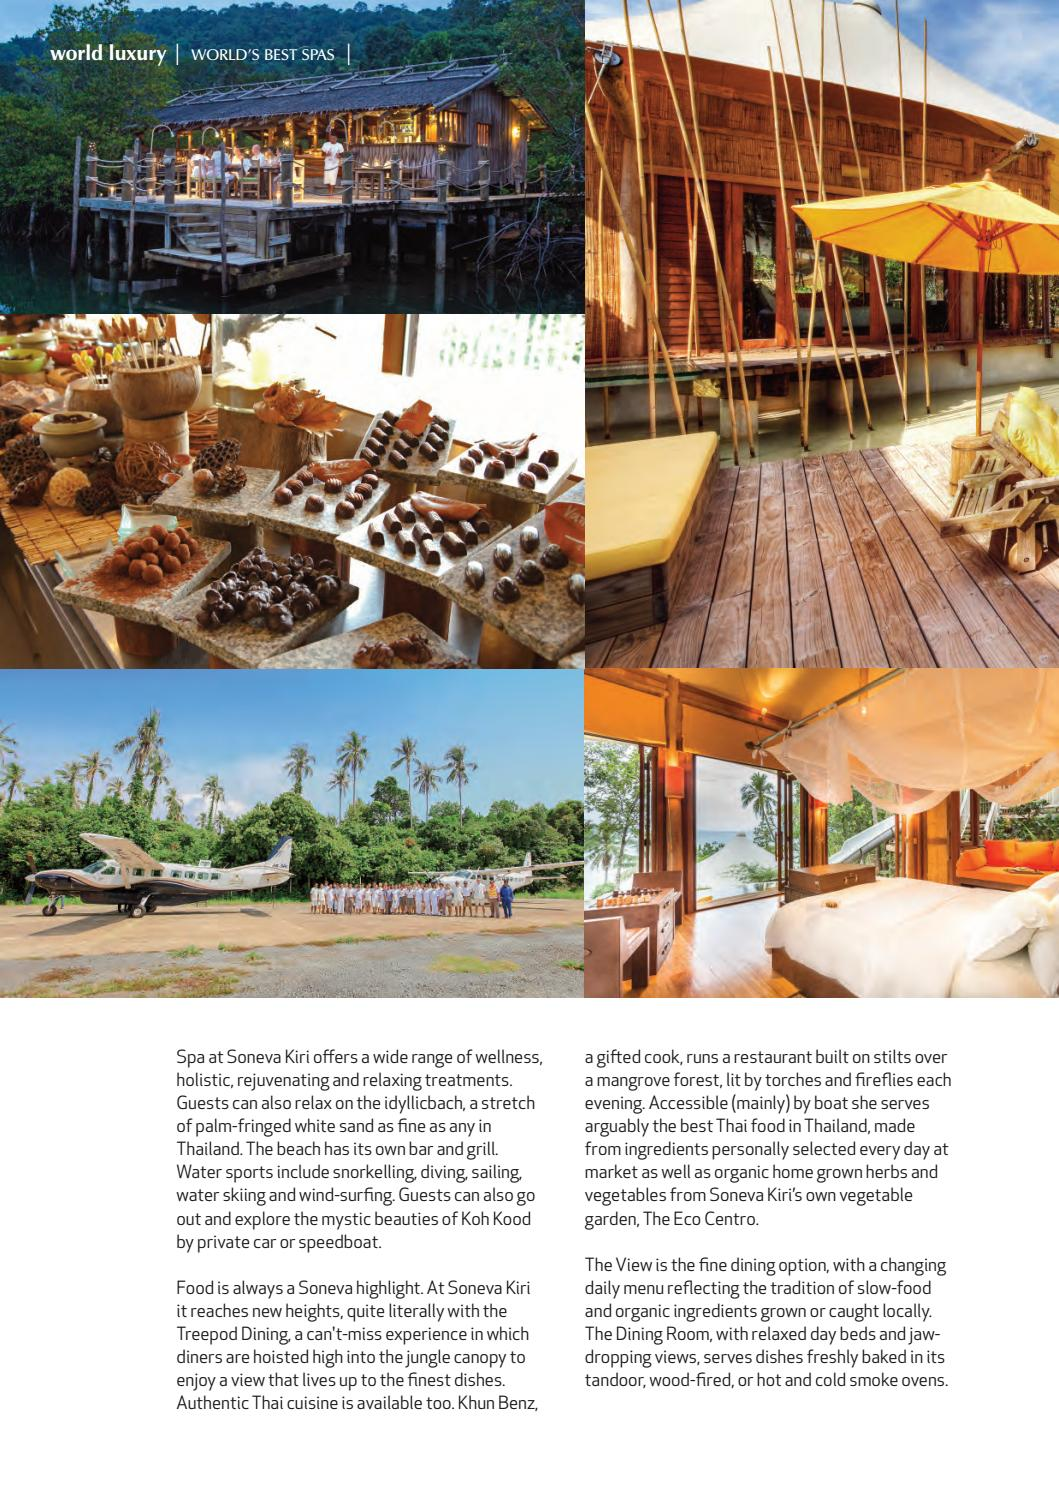 Best In Travel Magazine Issue 47 // 2018 // Discover Luxury Spas